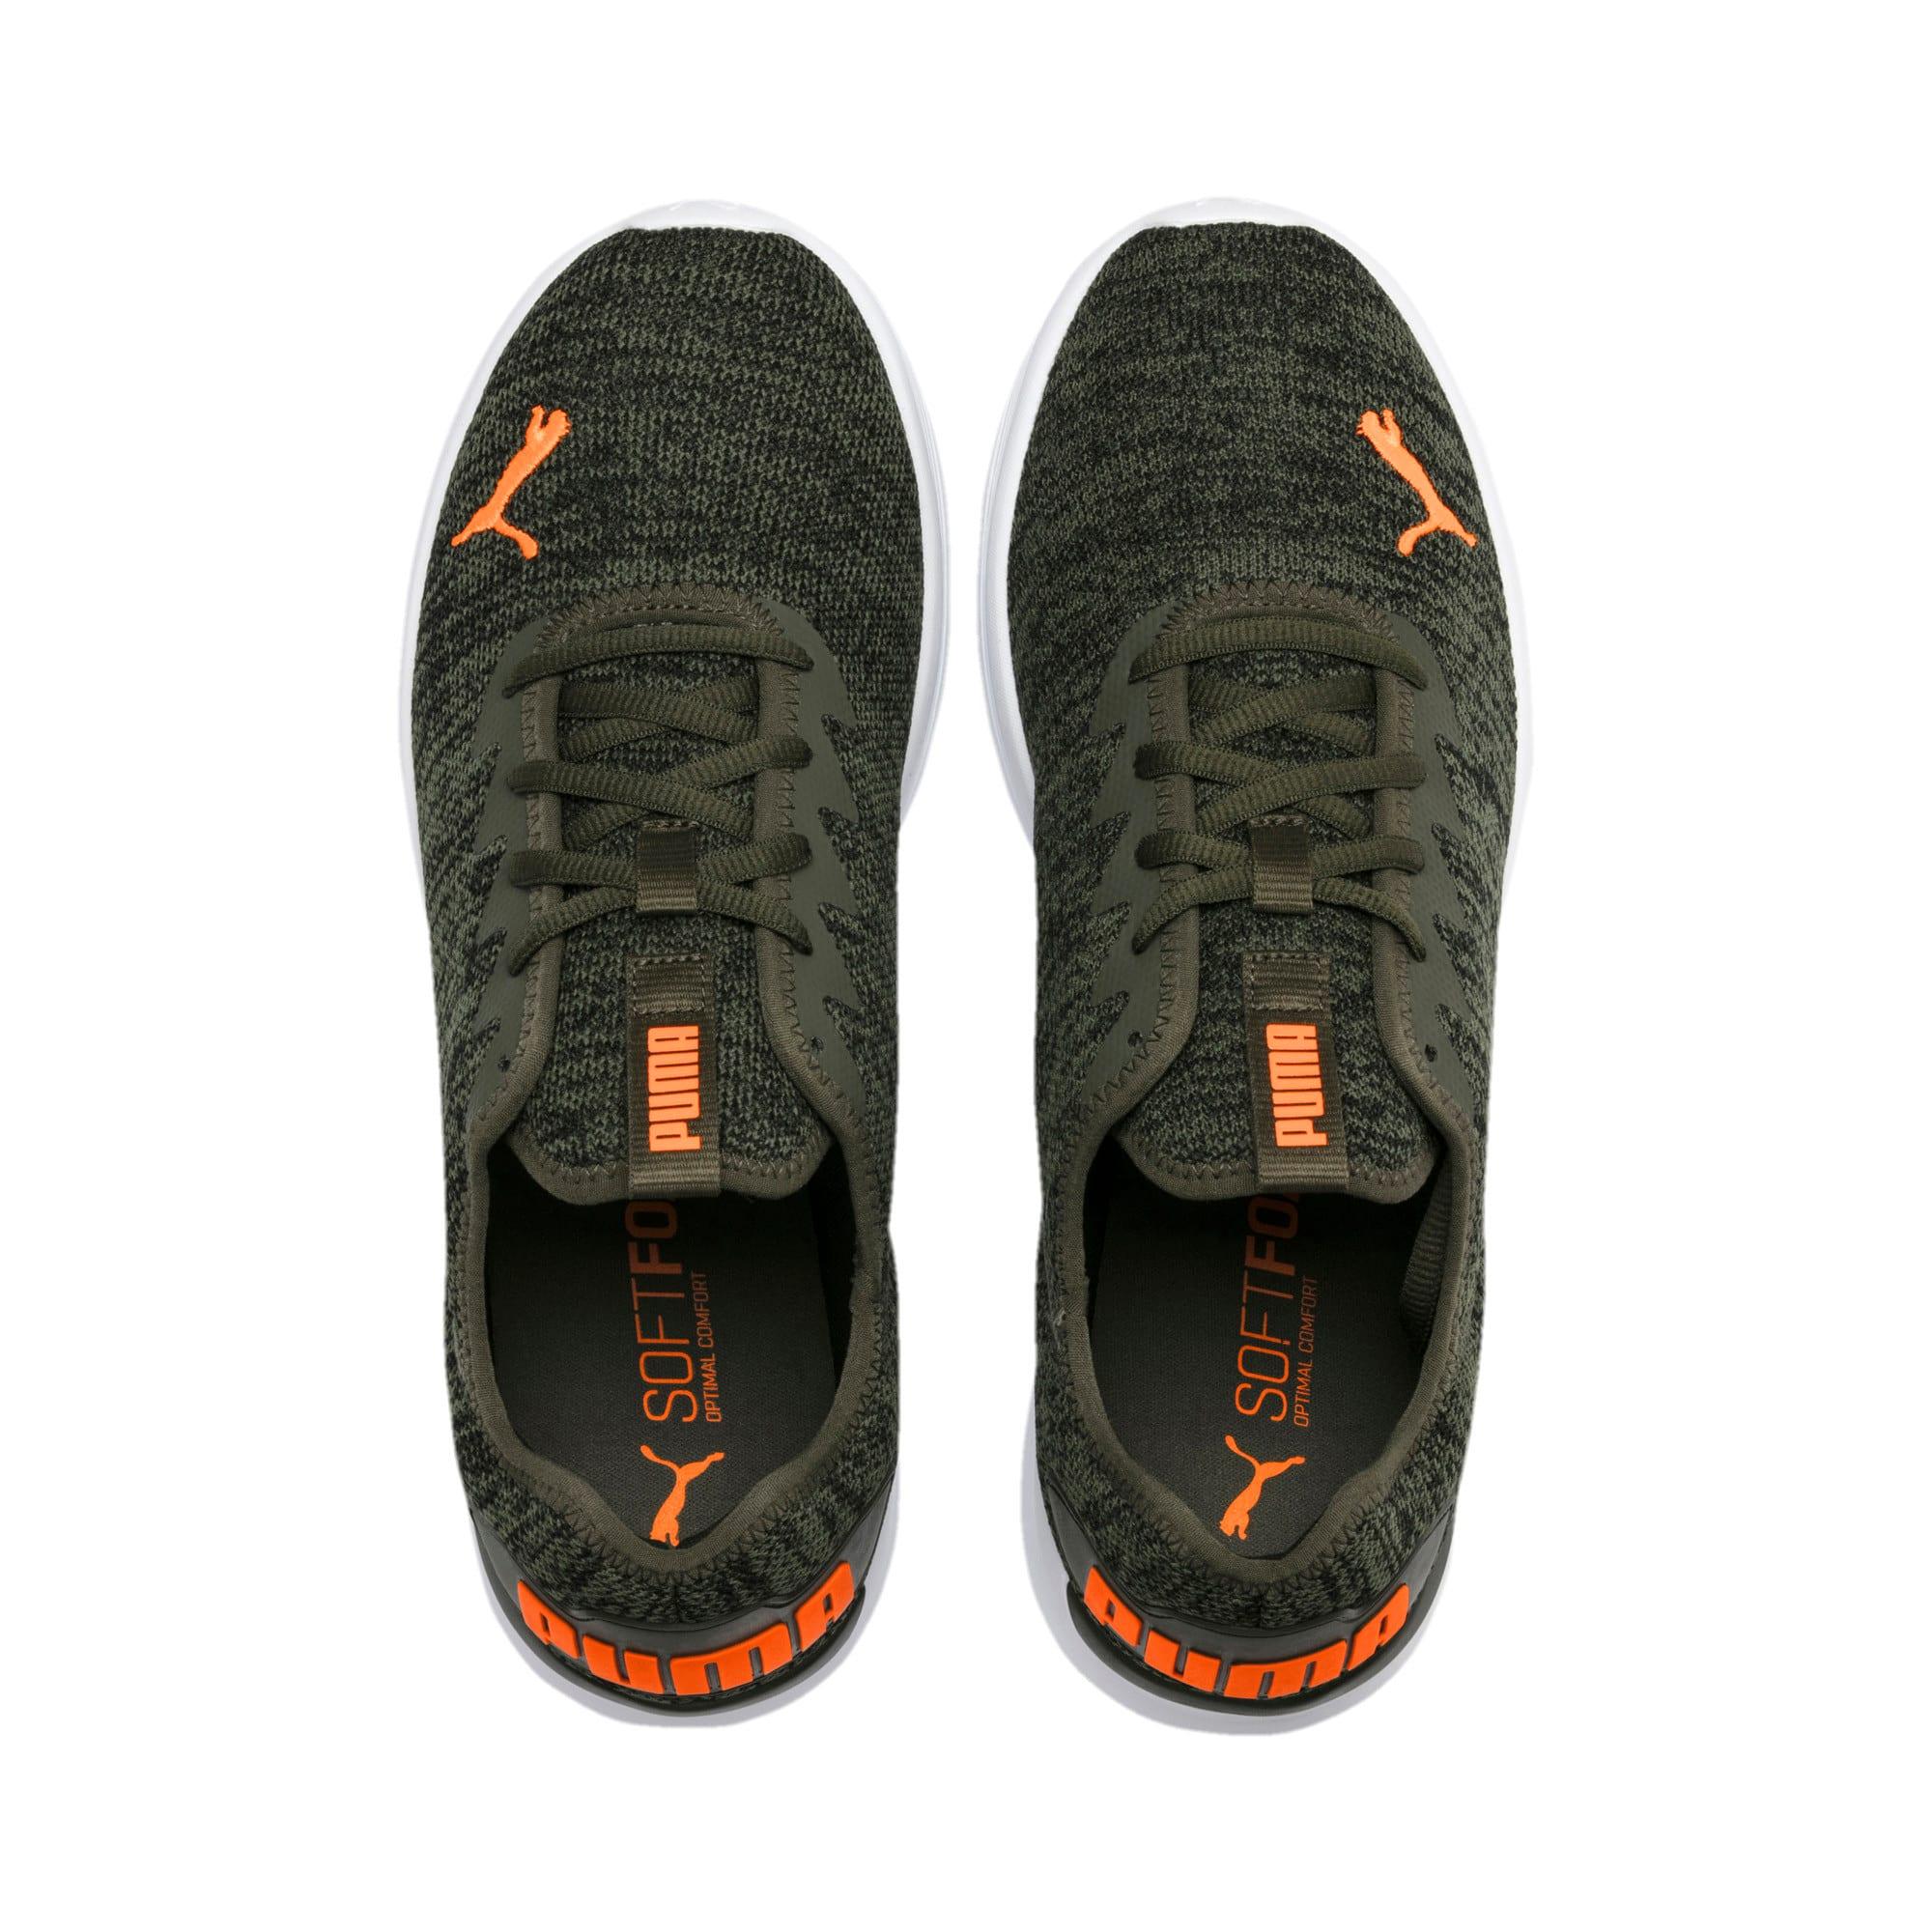 Thumbnail 2 of Ballast Men's Running Shoes, Forest Night-Black-Orange, medium-IND